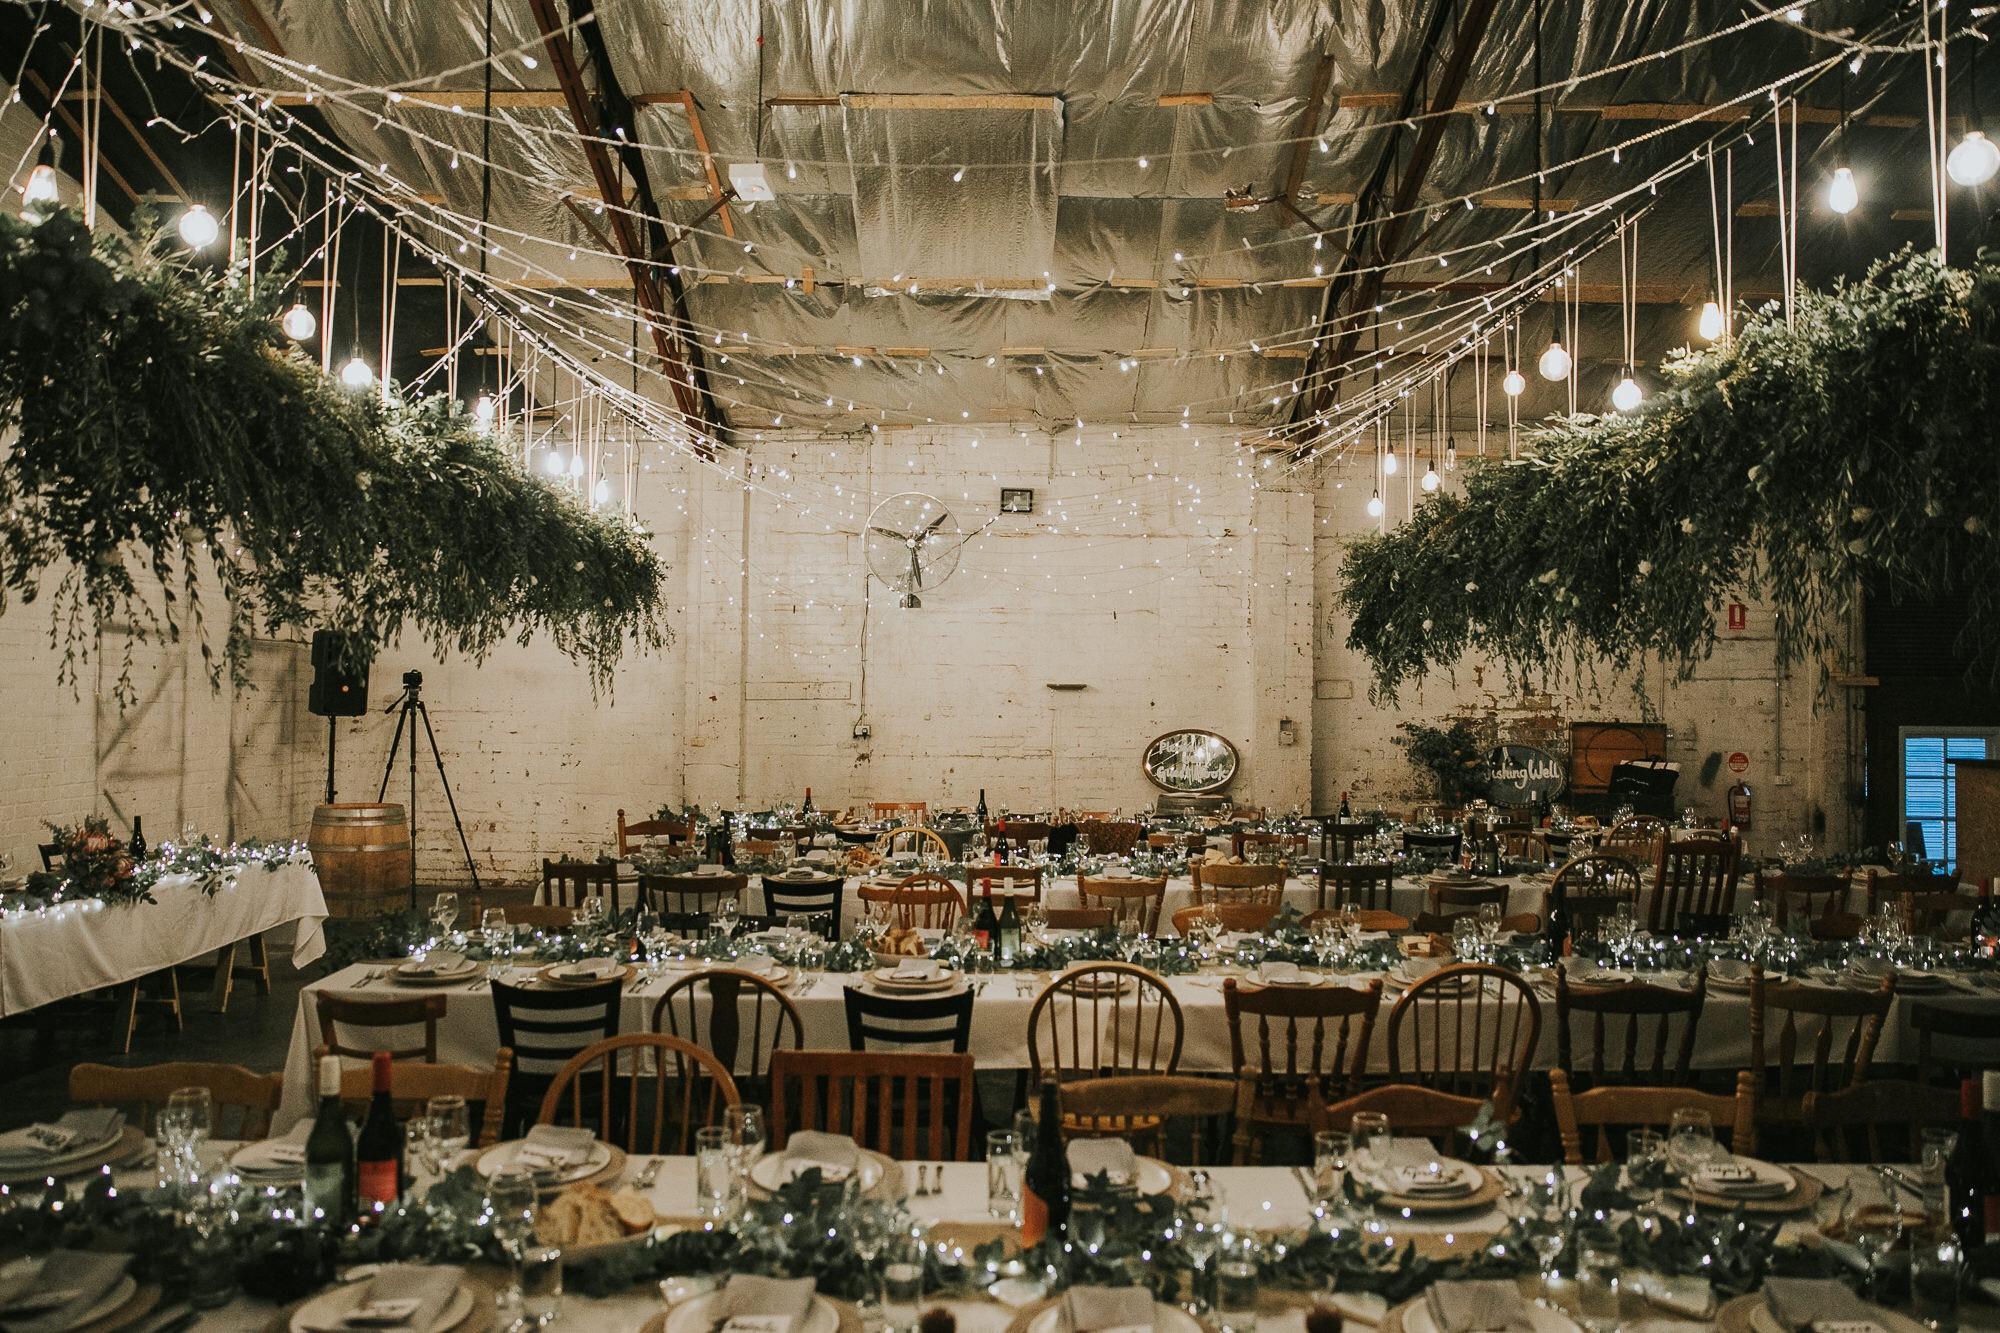 ThisDayForward_WeddingPhotography_Caitlin&Andrew_TheLine_MelbourneWedding_DigitalRes-452.jpg